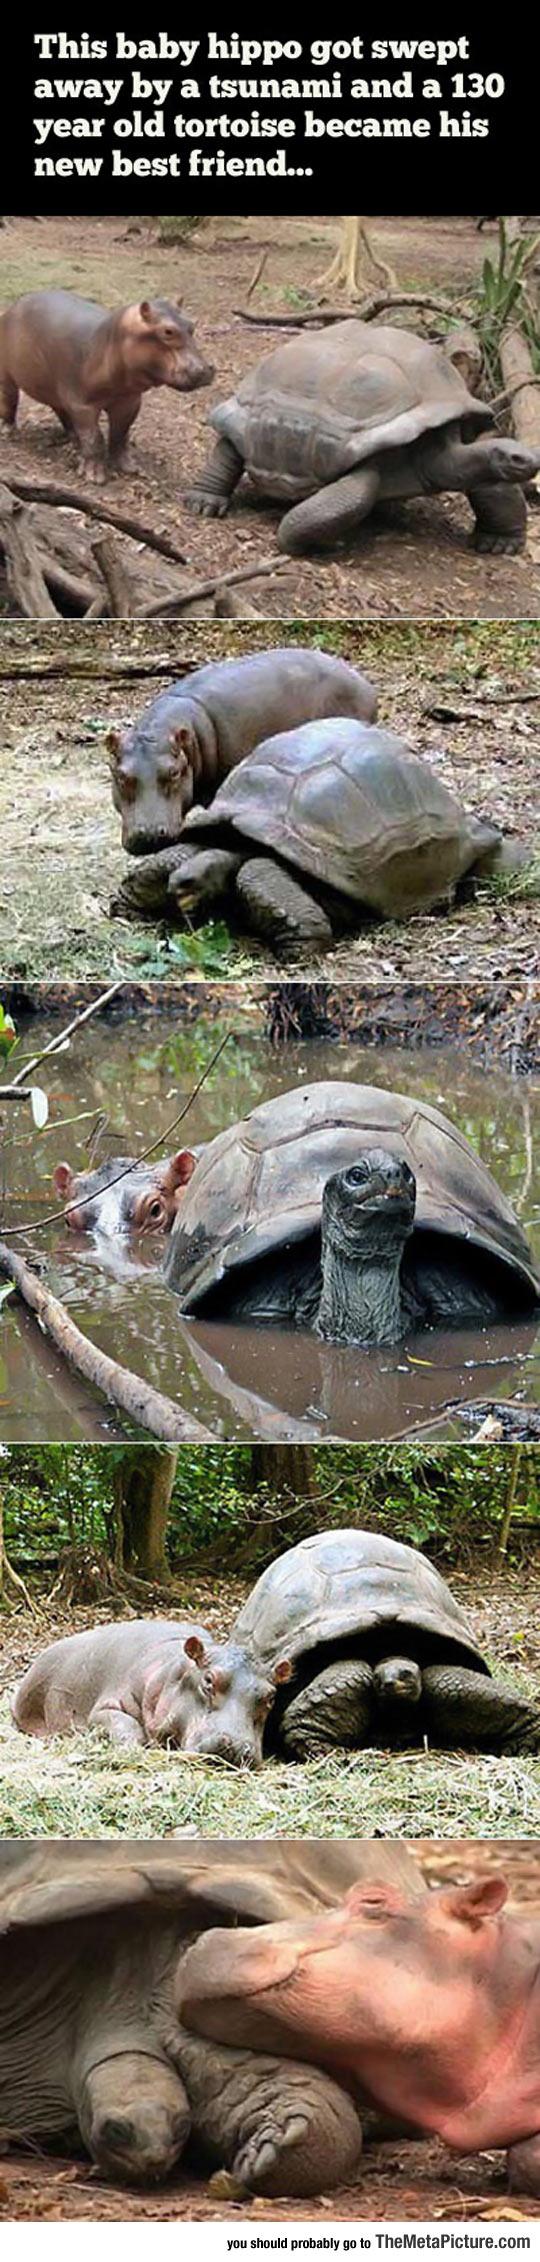 cool-baby-hippo-tortoise